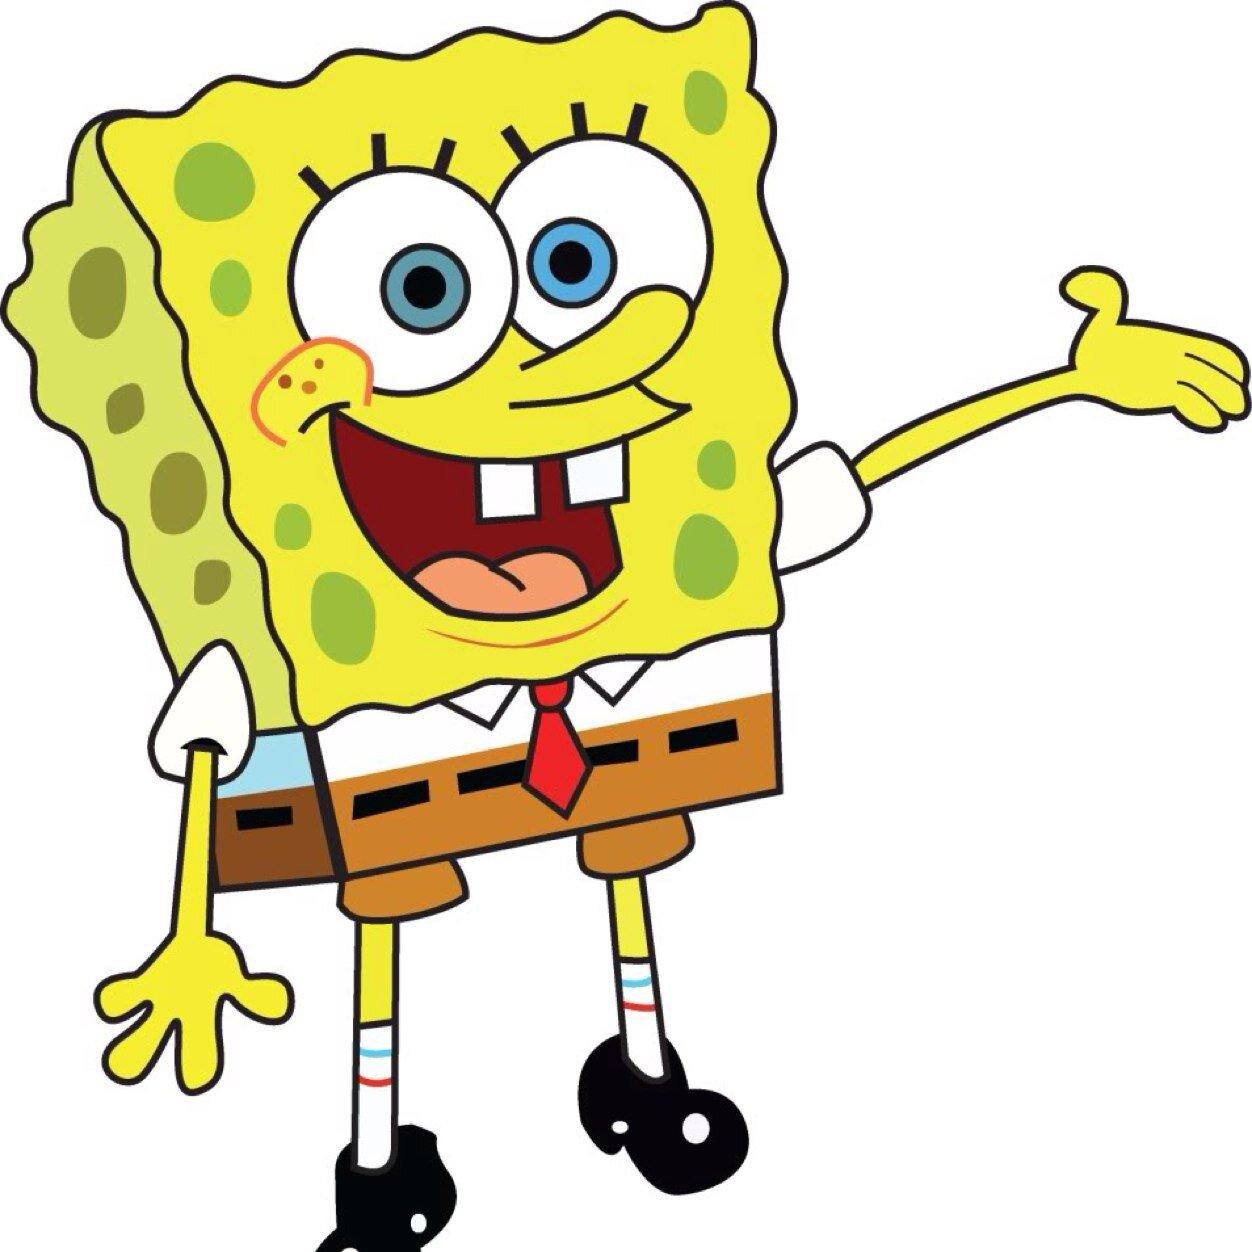 Spongebob nudepics Nude Photos 41